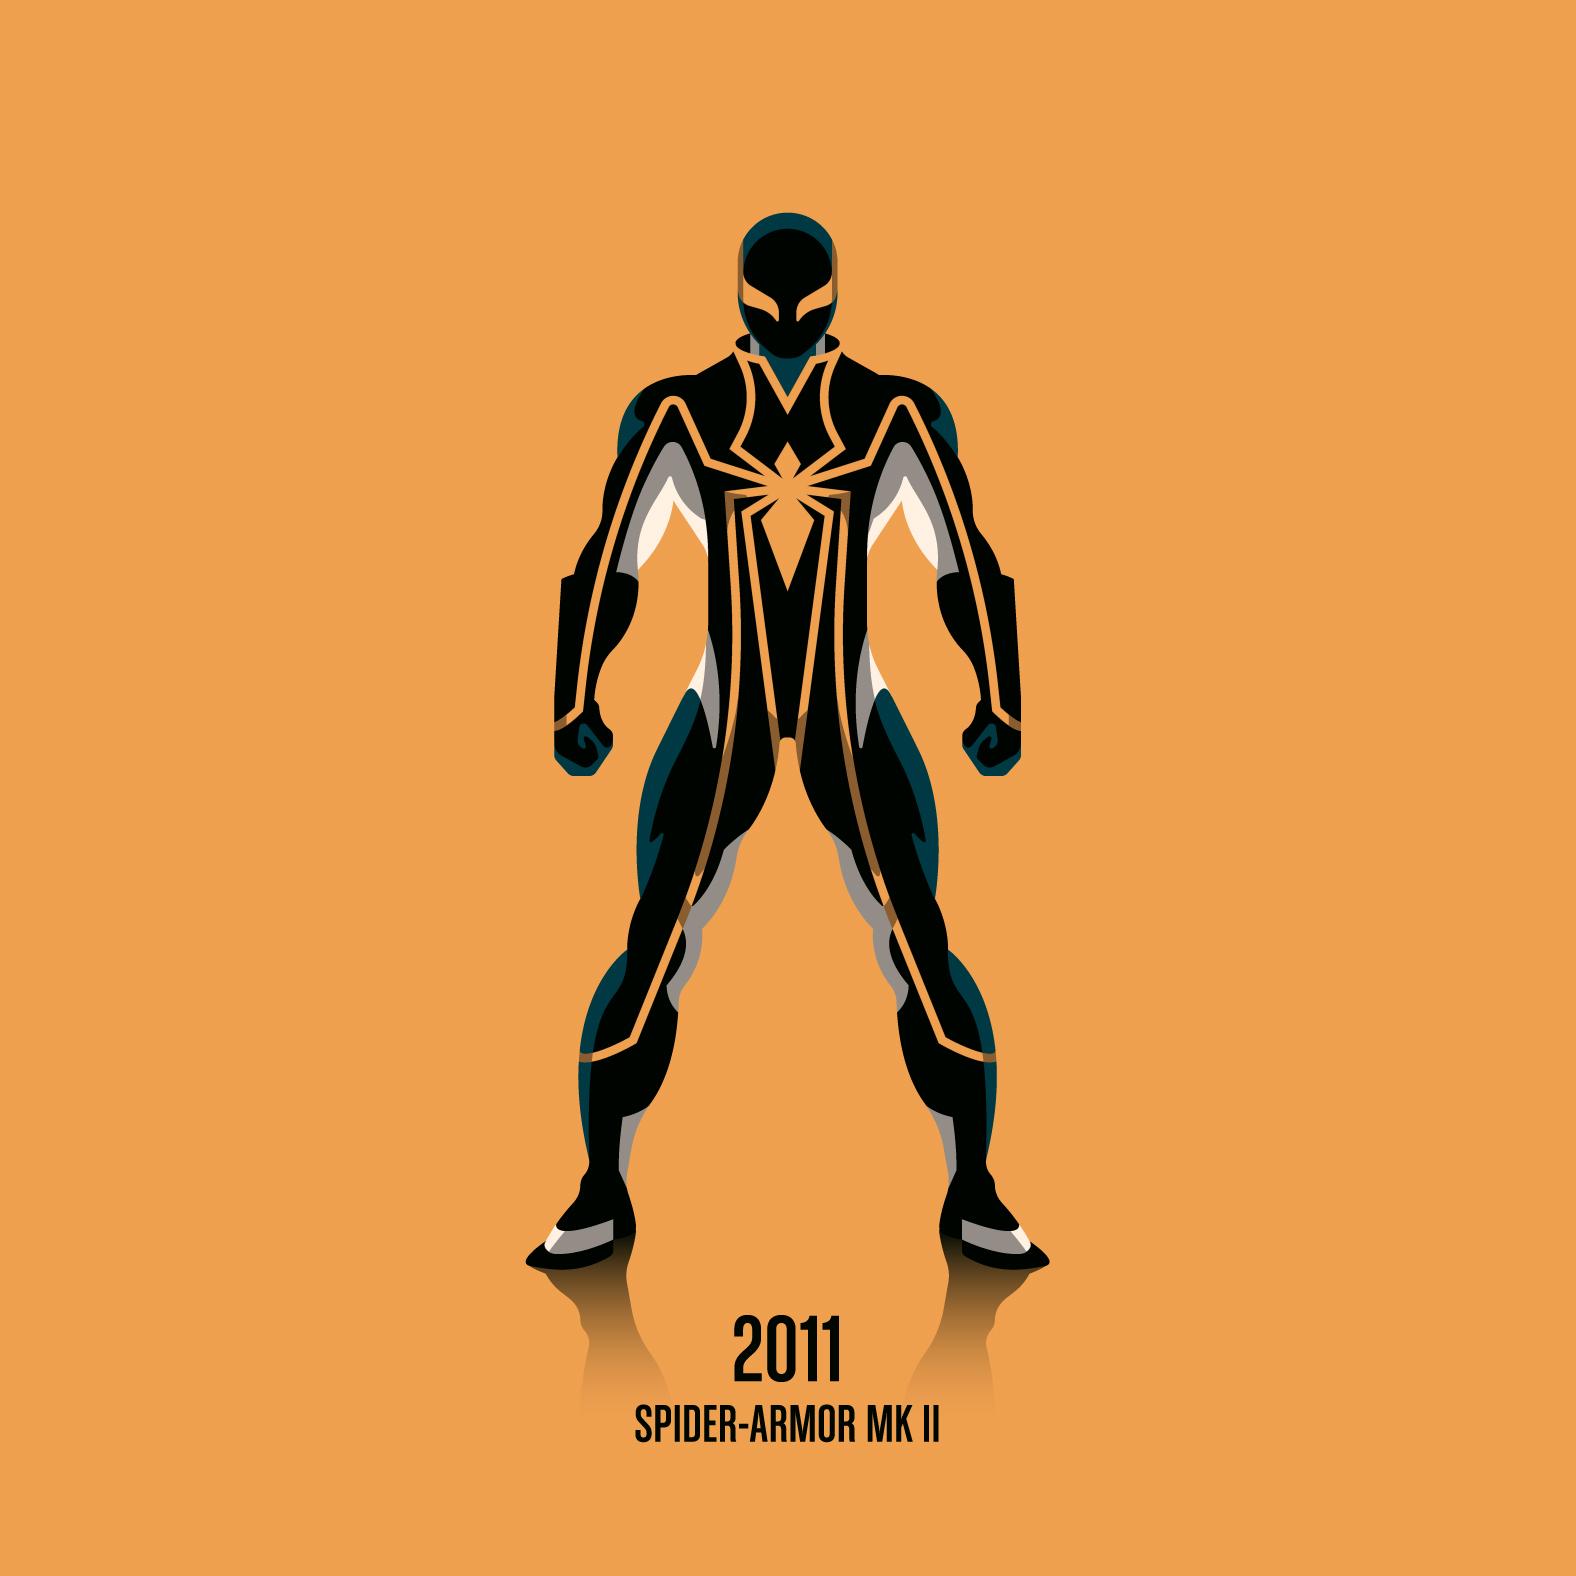 2_spiderman-12.jpg